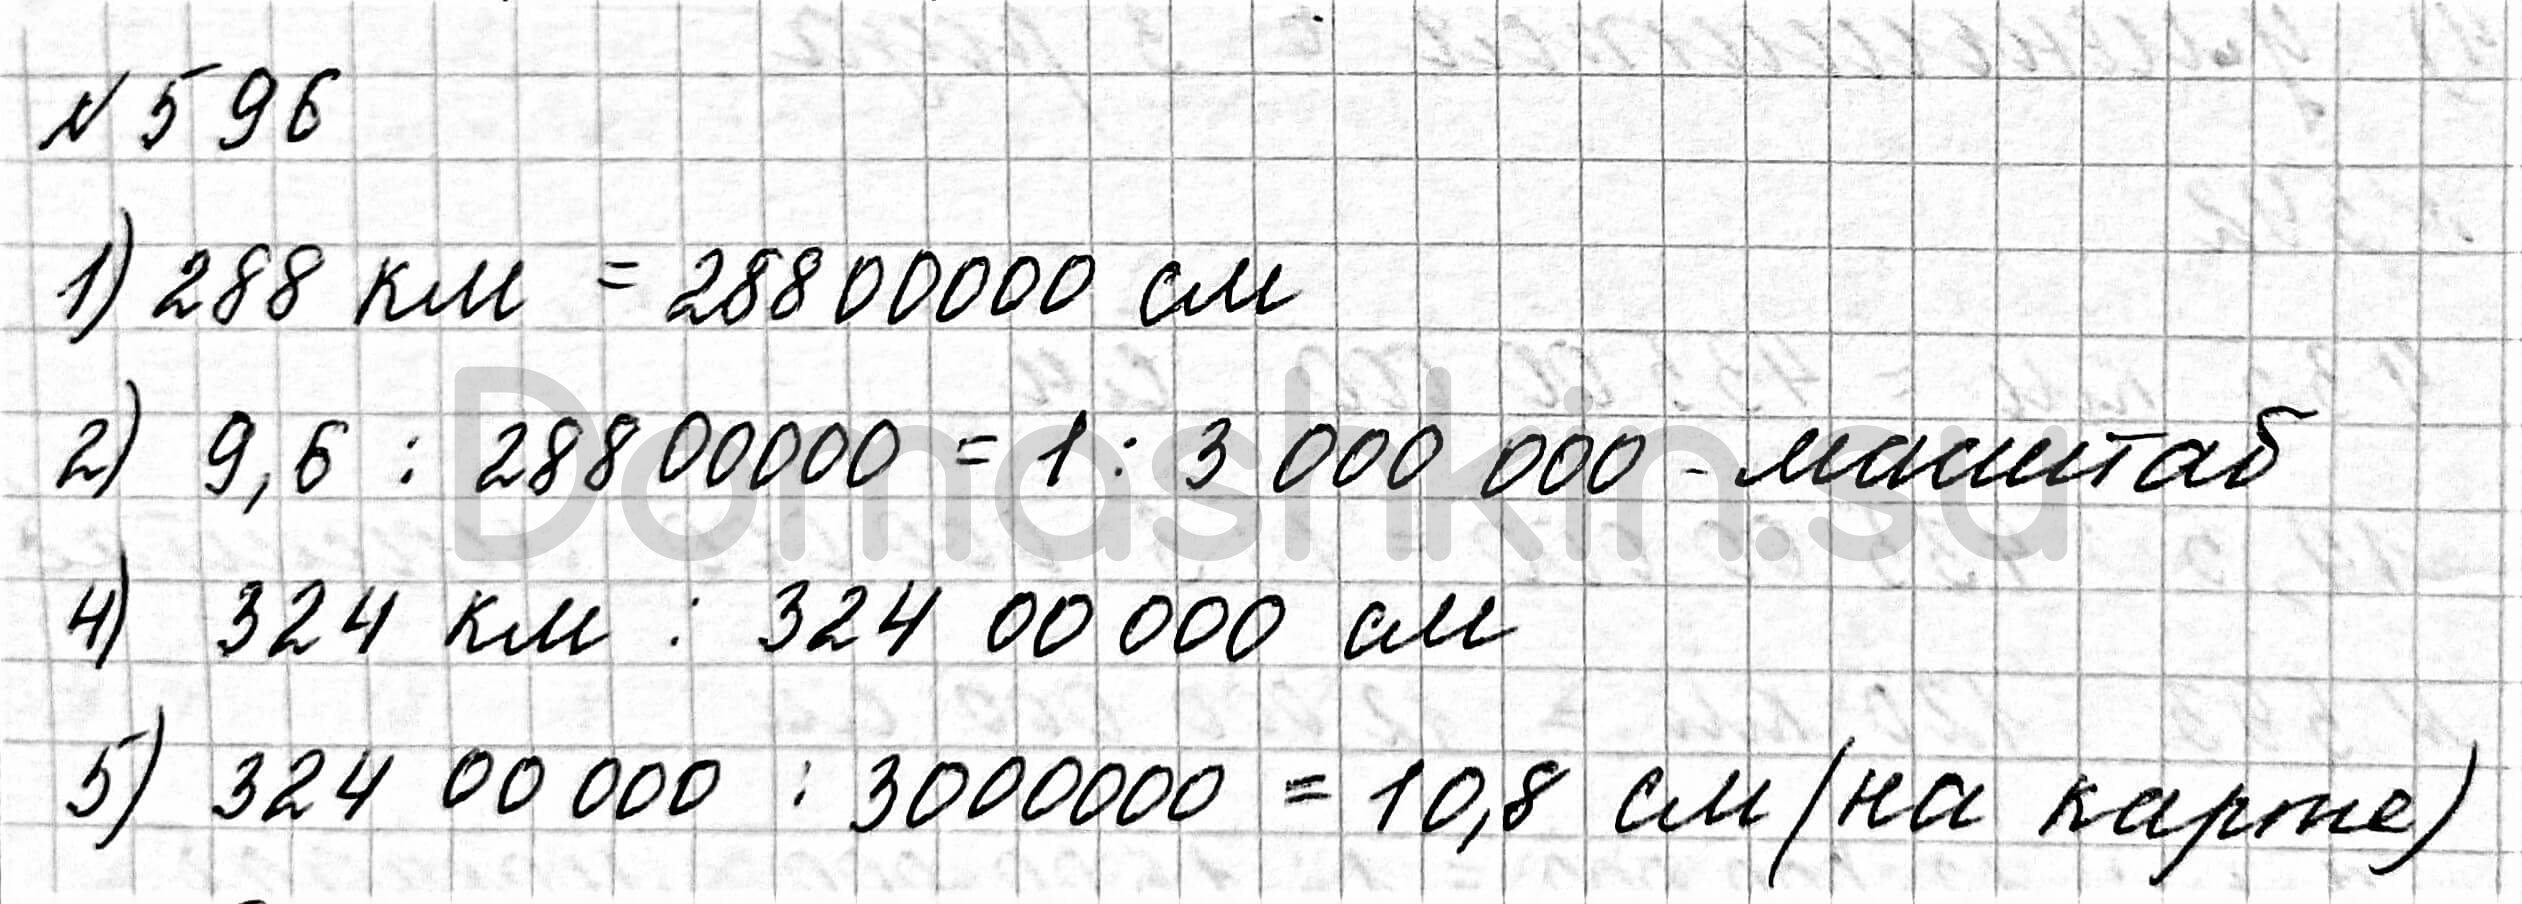 Математика 6 класс учебник Мерзляк номер 596 решение